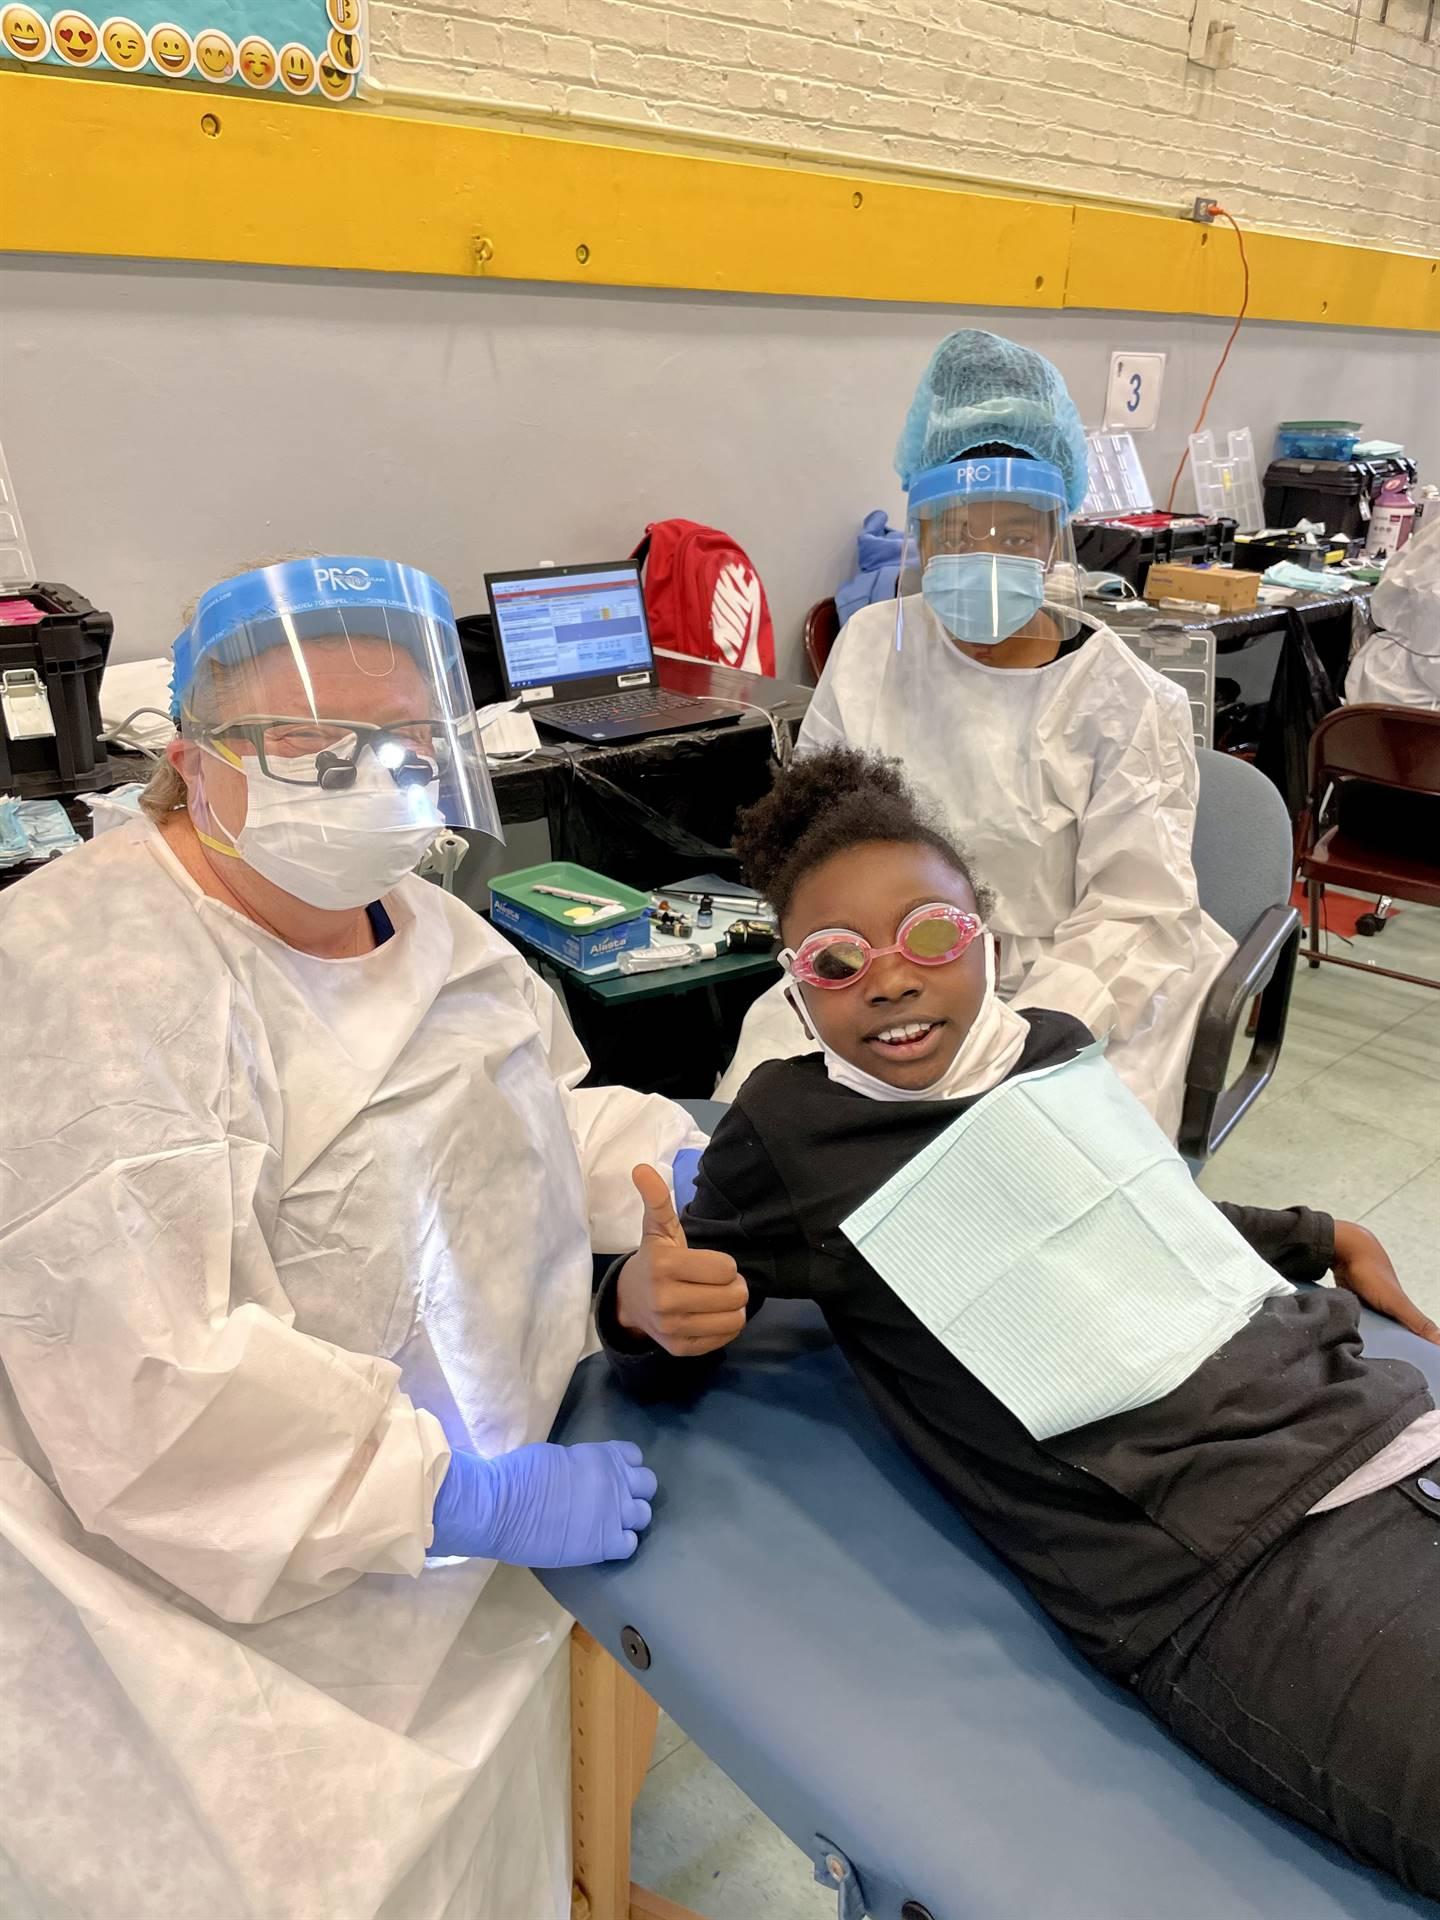 Dental Clinic at WES - 5/7/2021